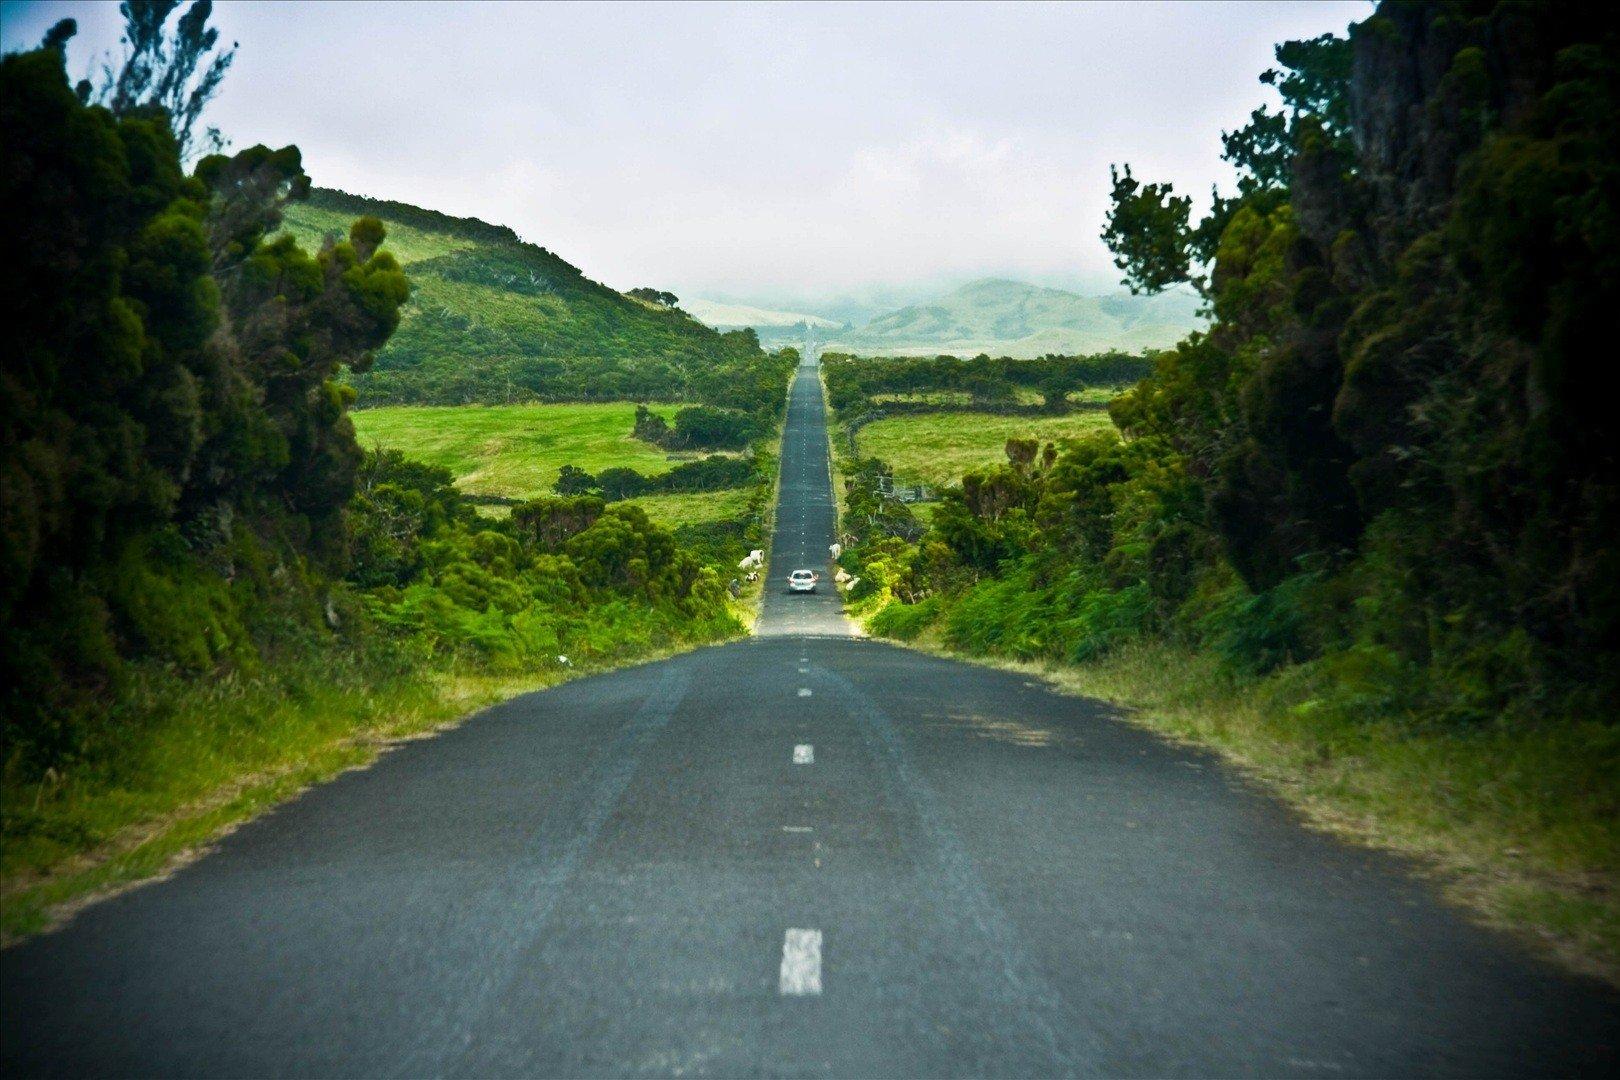 Azores bike tour long road